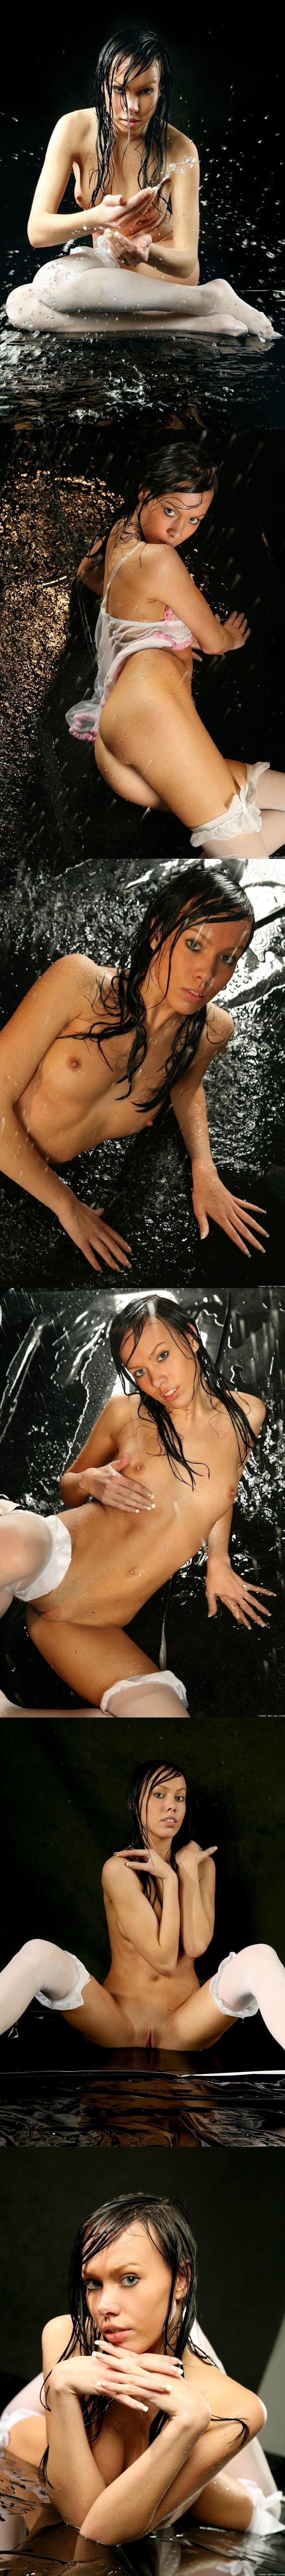 Met-Art MA 20080621 - Dahlia A - Bagnare - by Rylsky